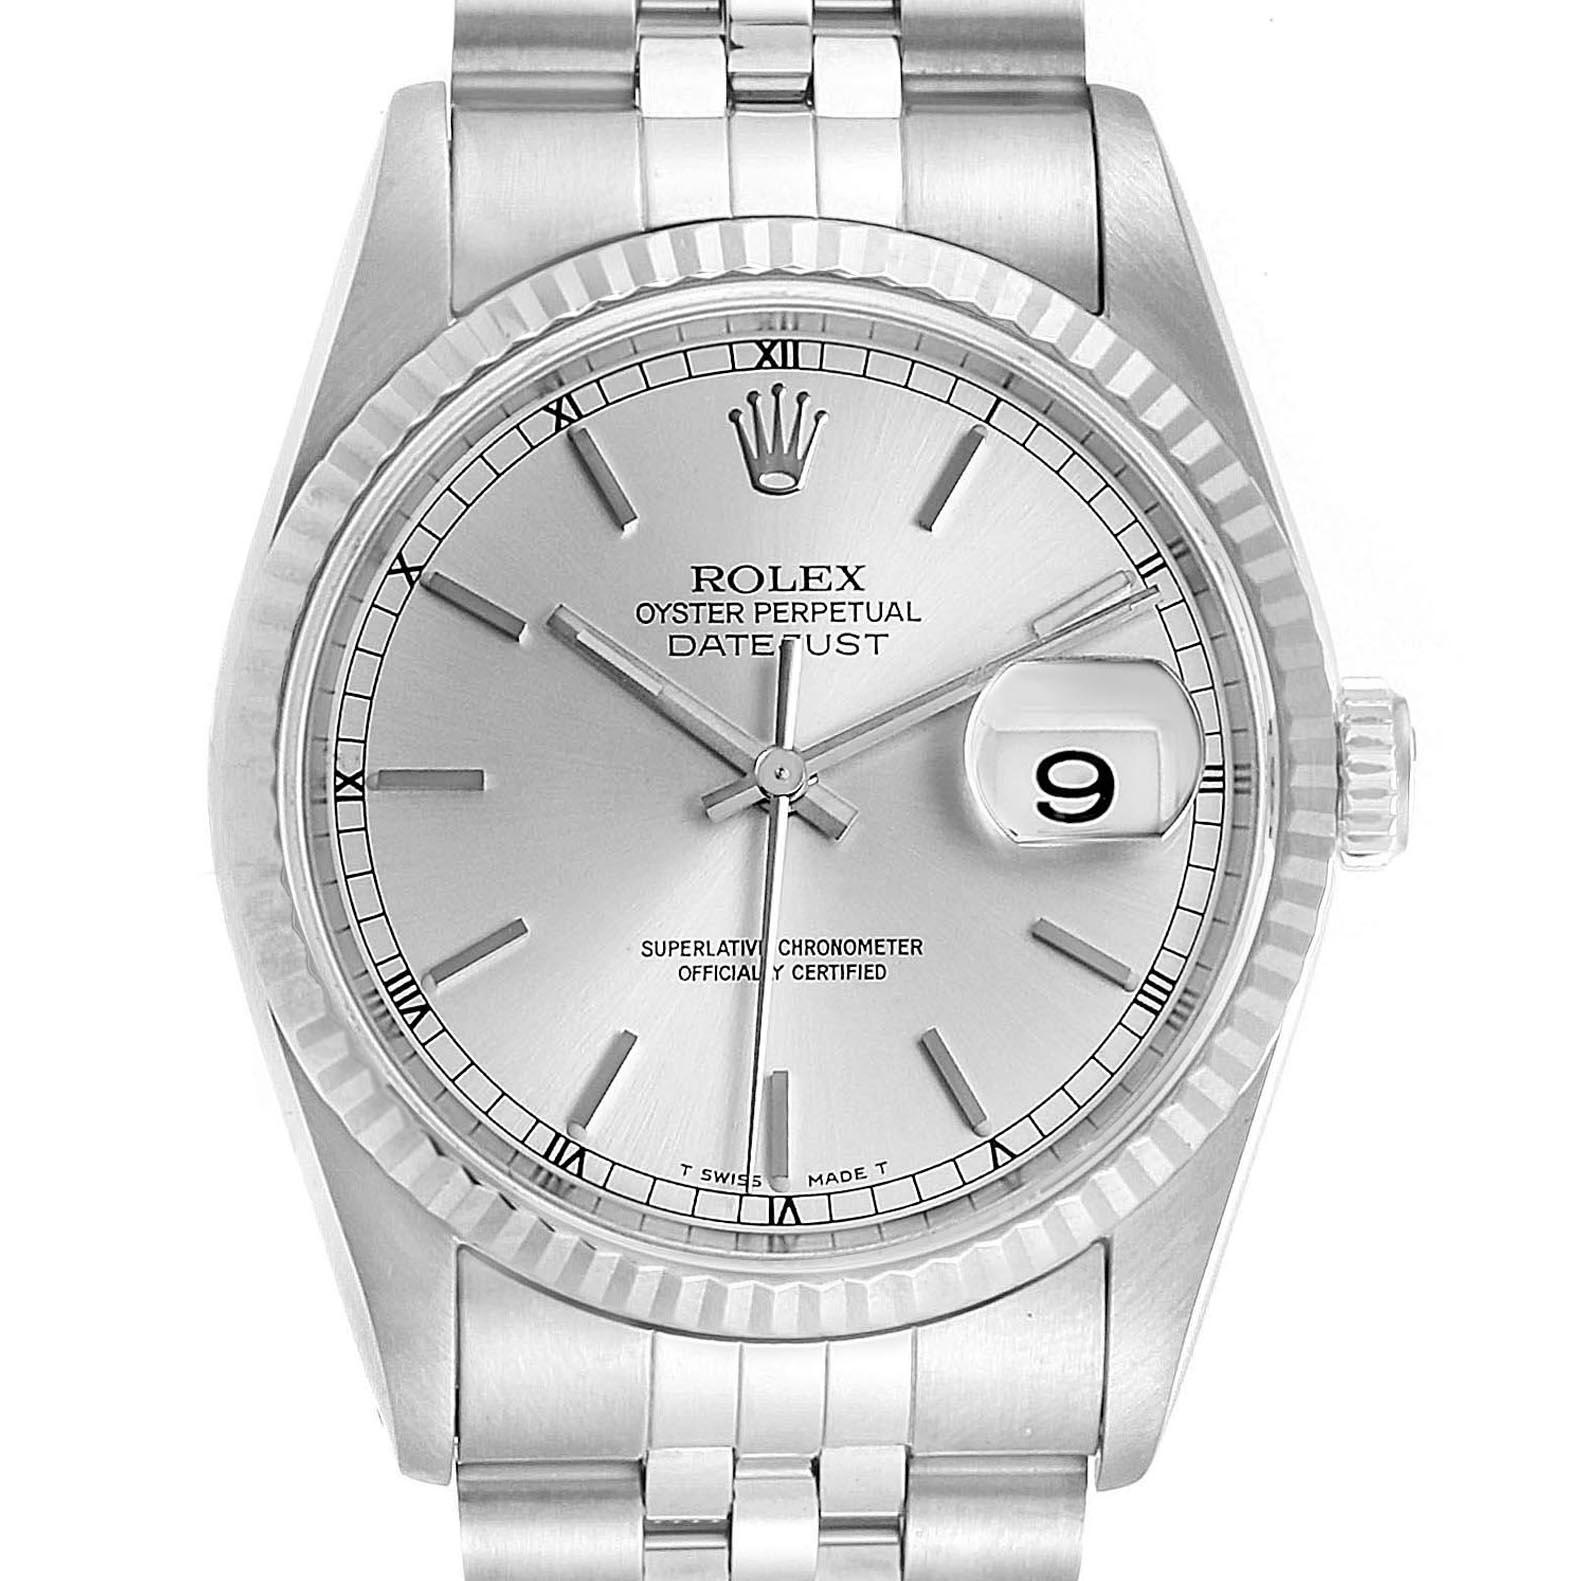 Rolex Datejust White Dial Jubilee Bracelet Steel & White Gold Mens Watch 16234